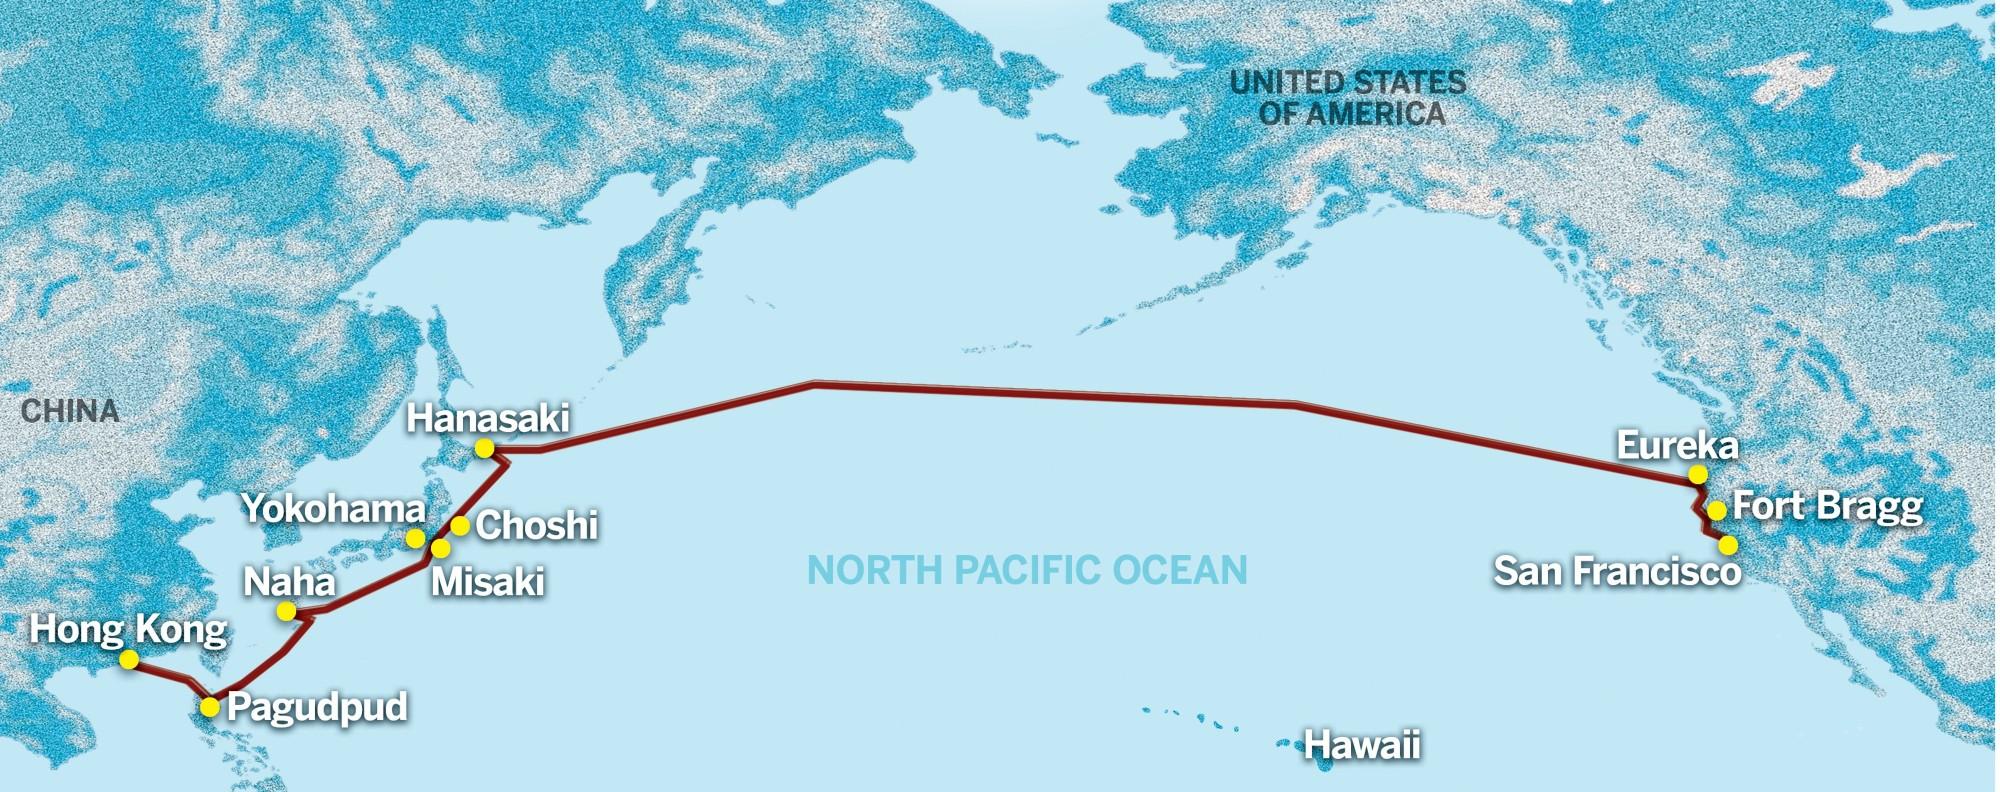 Brian Platt's sailing route from Hong Kong to San Francisco, in 1959.